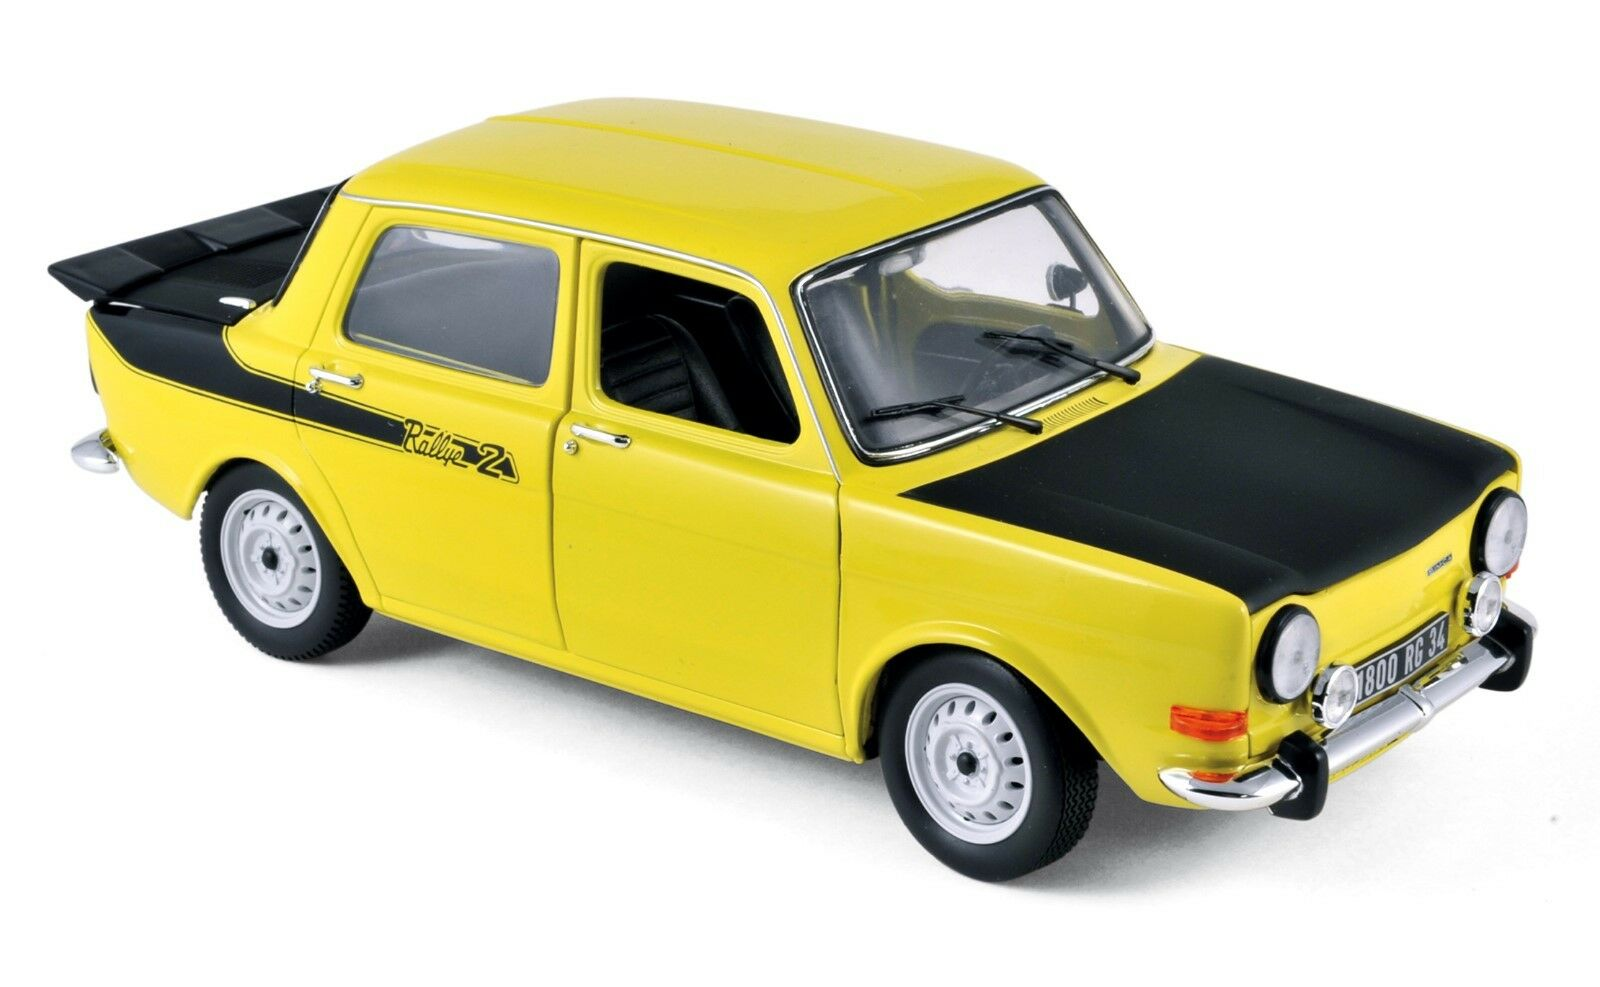 Simca 1000 Rallye 2 1976 gelb 1 18 18 18 Norev 185708 neu & OVP  | Grüne, neue Technologie  c89a9a